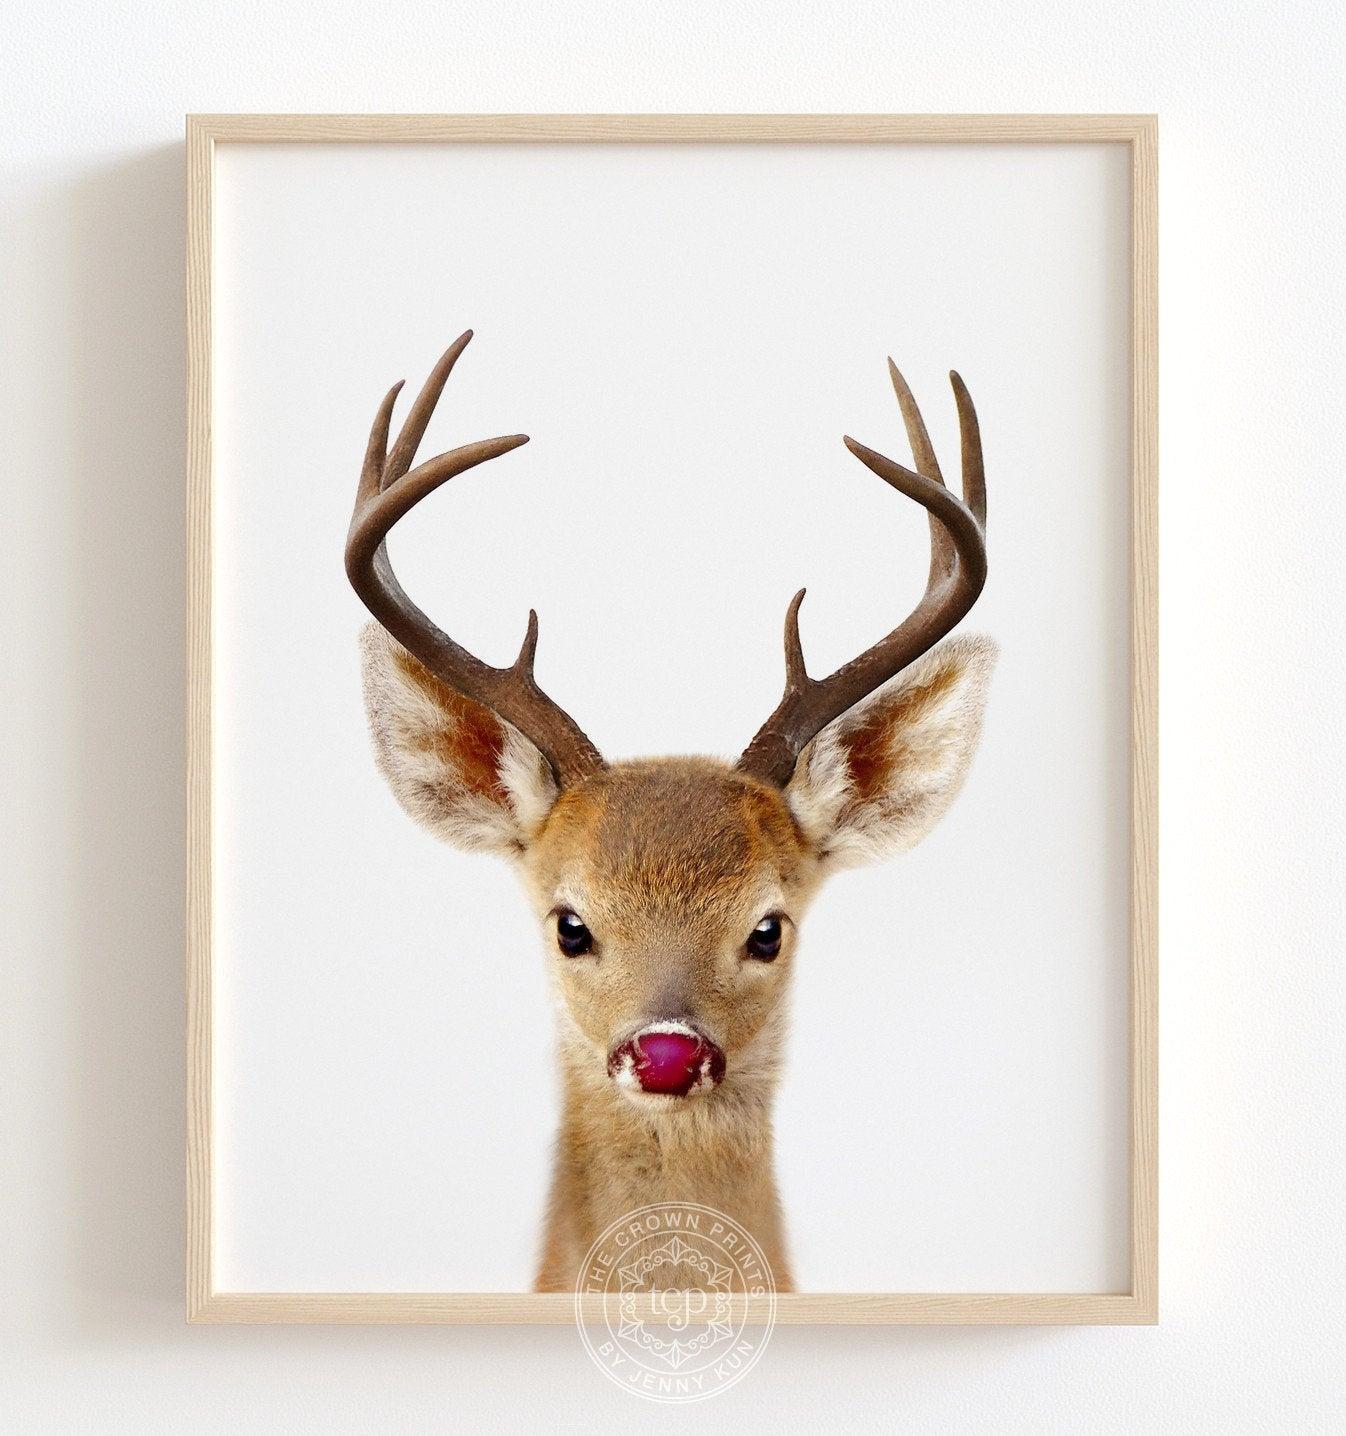 Reindeer Print Rudolph The Red Nosed Reindeer Christmas